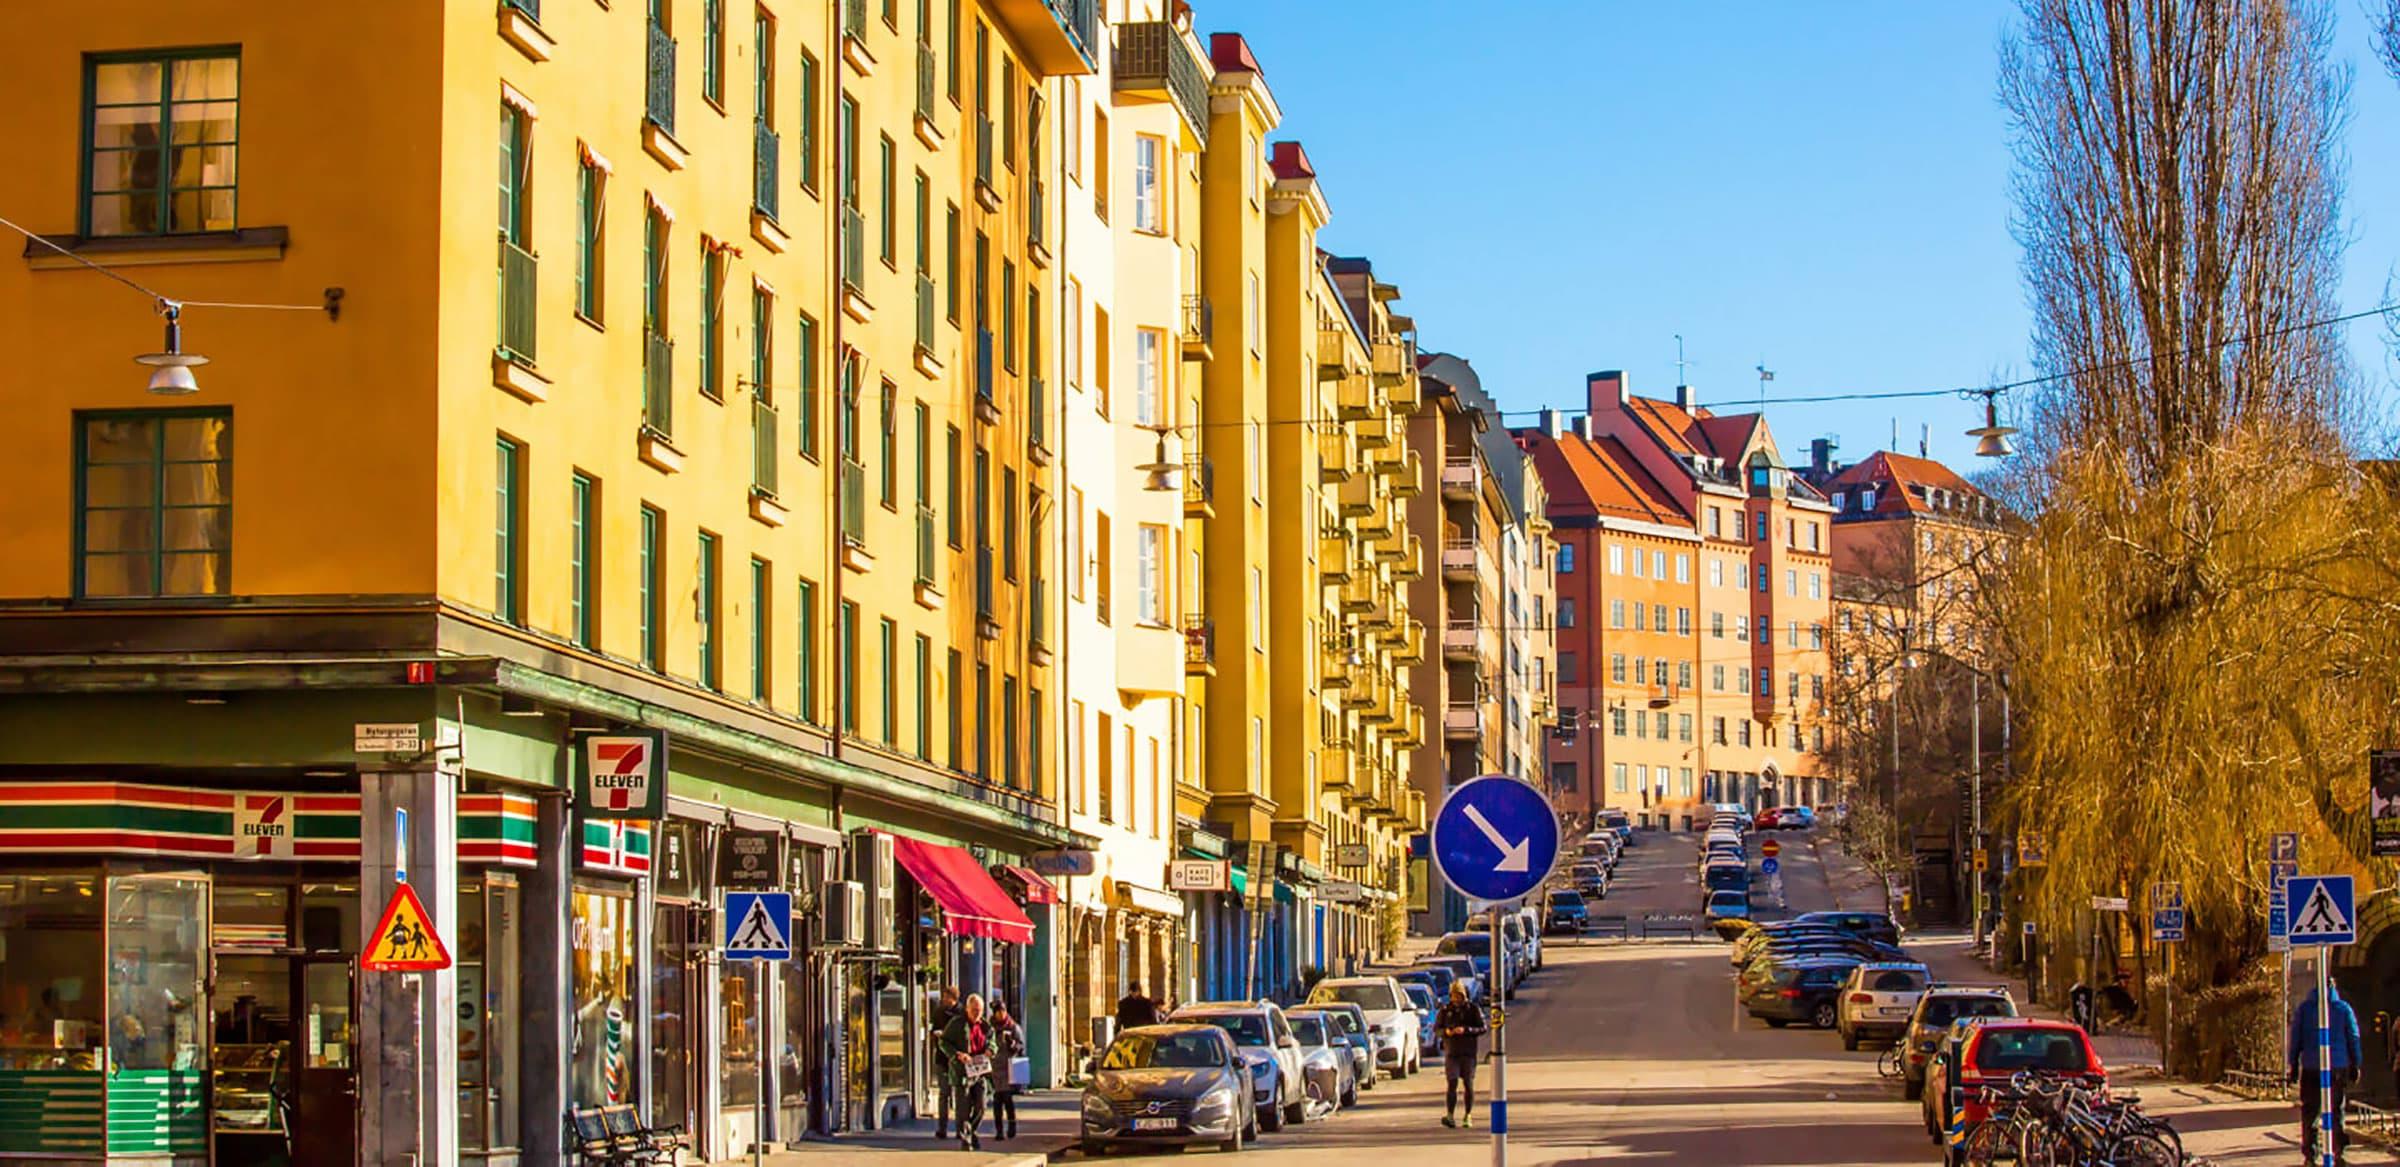 7a698a832 Bästa shoppingen på Södermalm – Thatsup